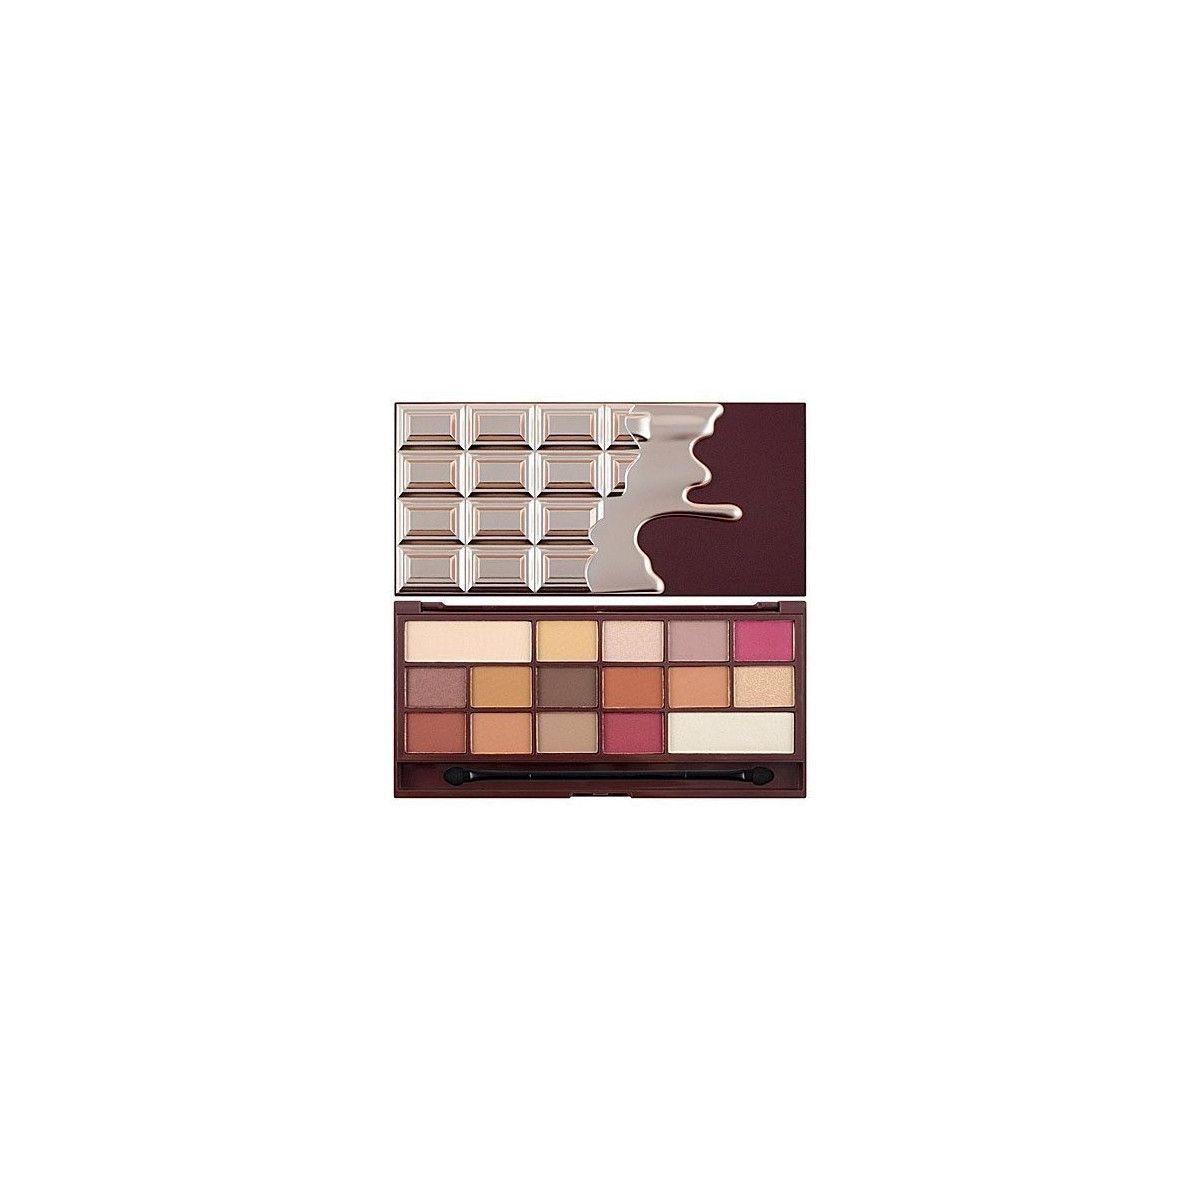 Makeup Revolution 16 Eyeshadows I Love Makeup Chocolate Elixir, satynowe i matowe cienie 22g